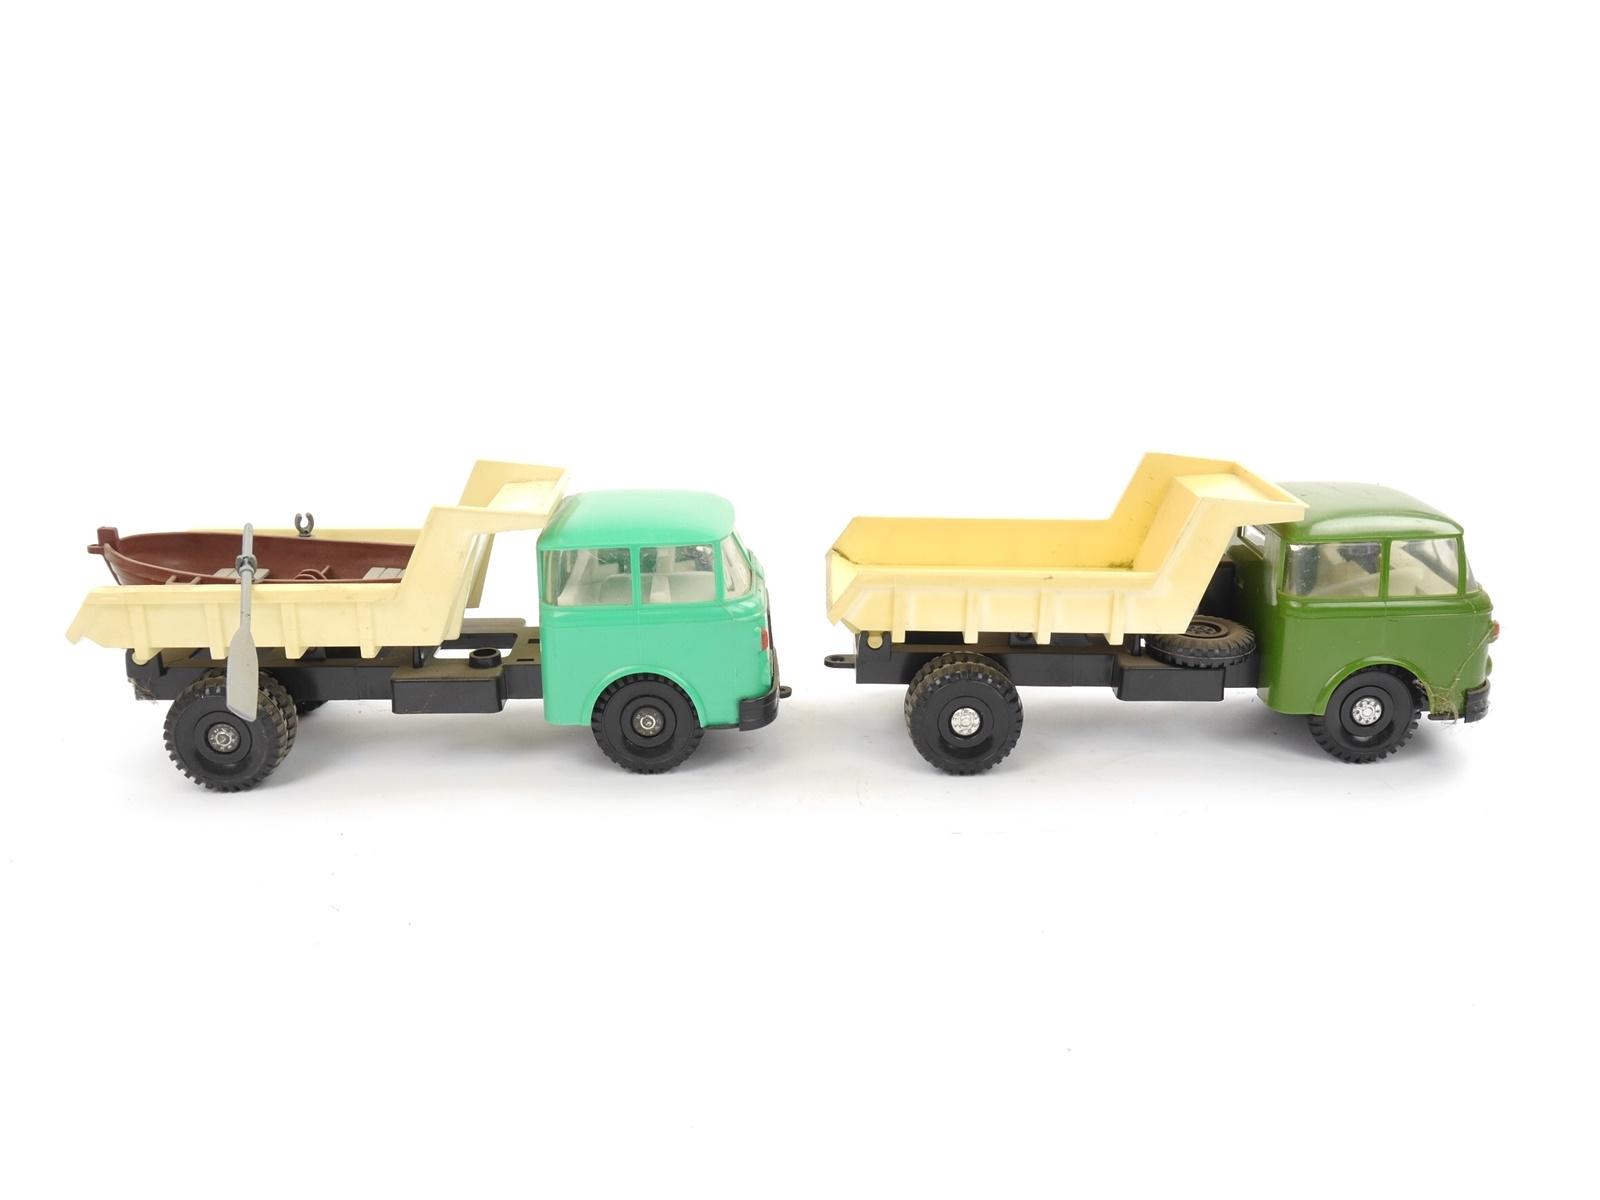 E103 2x Spielzeug Spielzeugauto LKW Kipper Muldenkipper Skoda + Ruderboot *DDR*